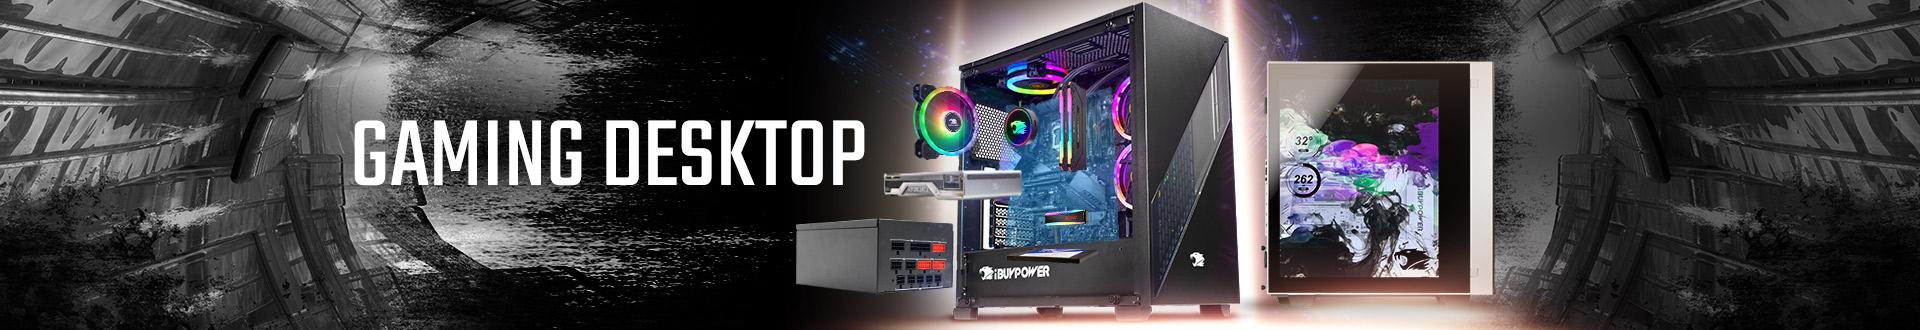 Gaming Pcs Desktop Computers Ibuypower